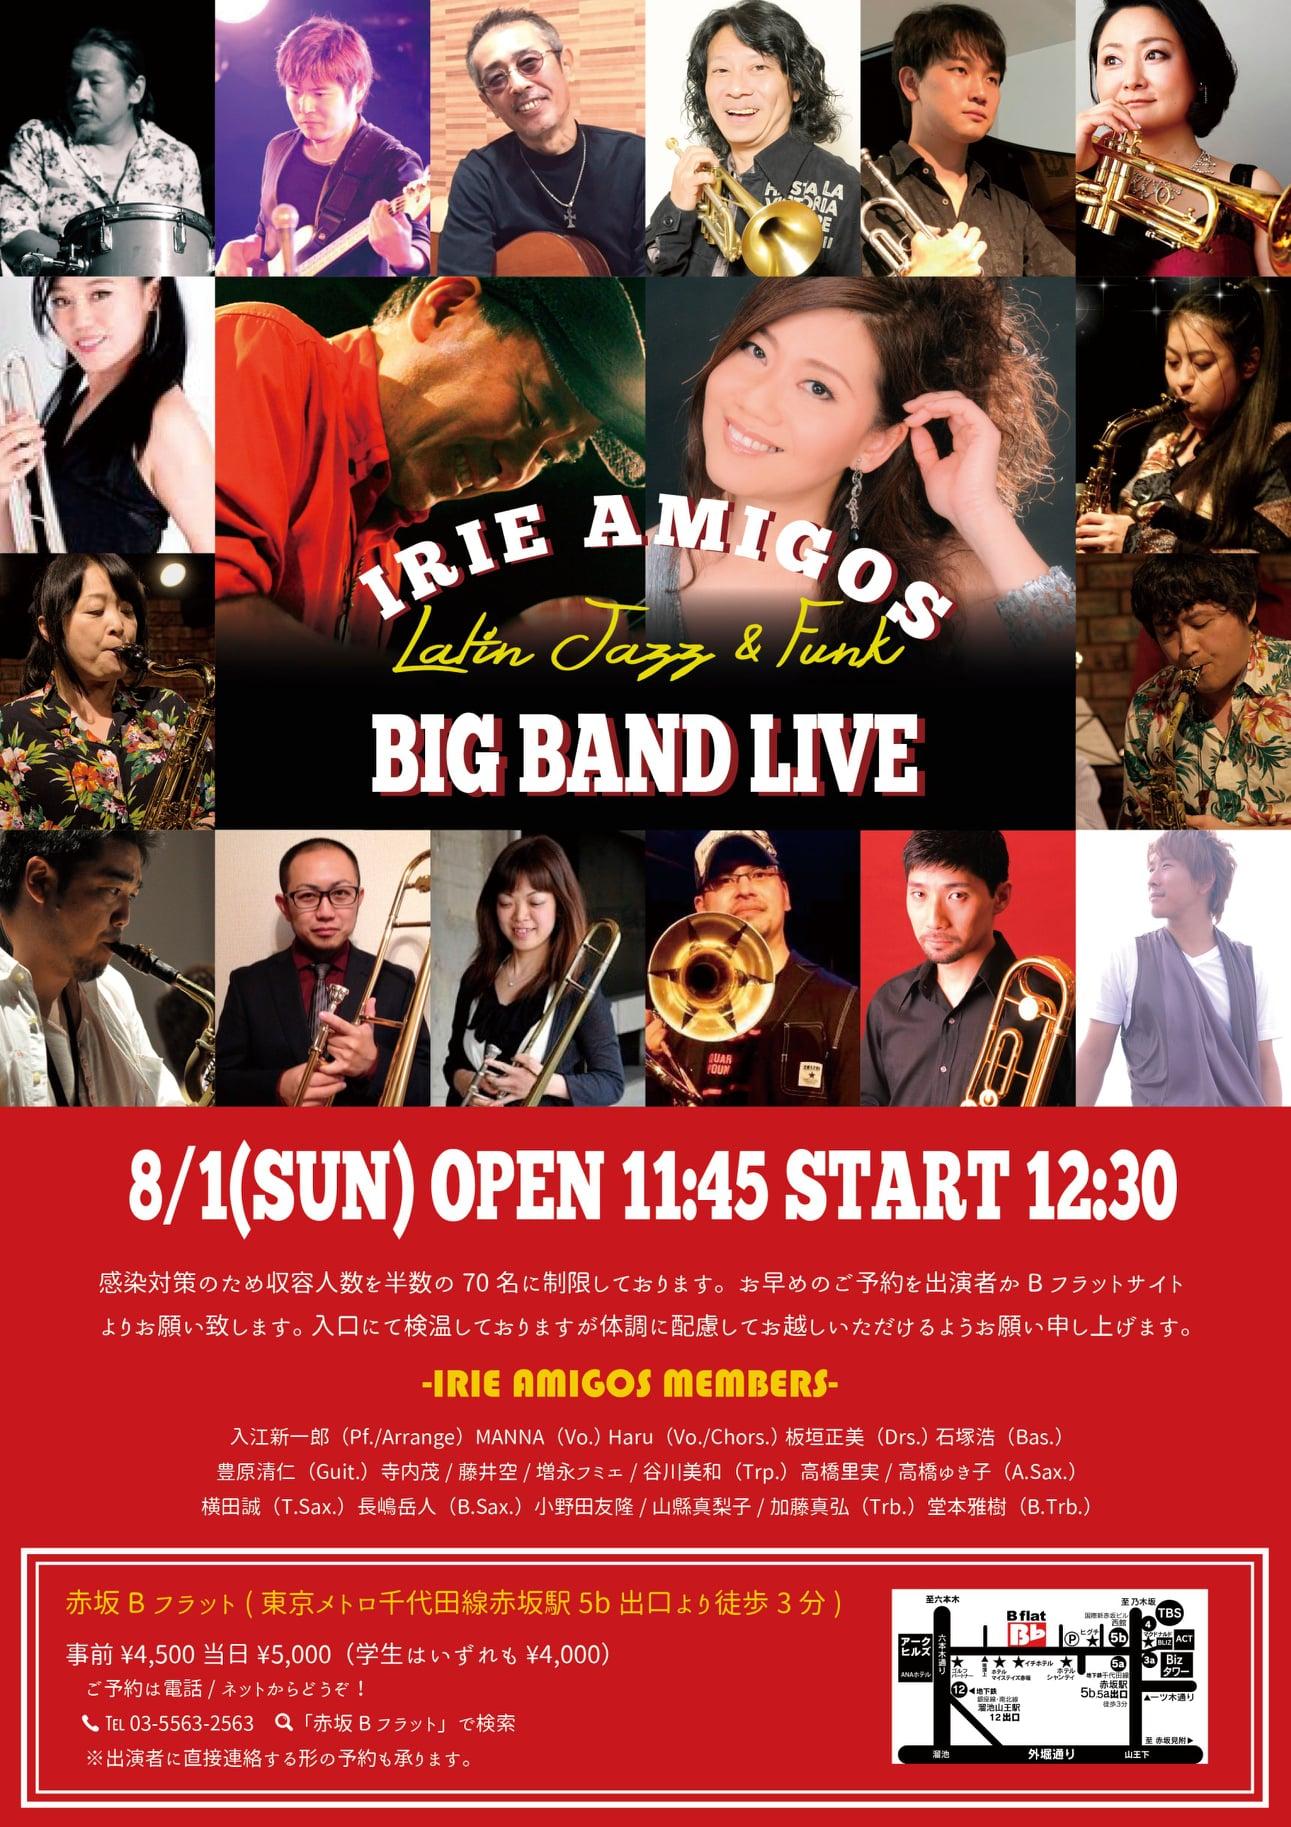 IRIE AMIGOS Latin Jazz & Funk BIG BAND LIVE